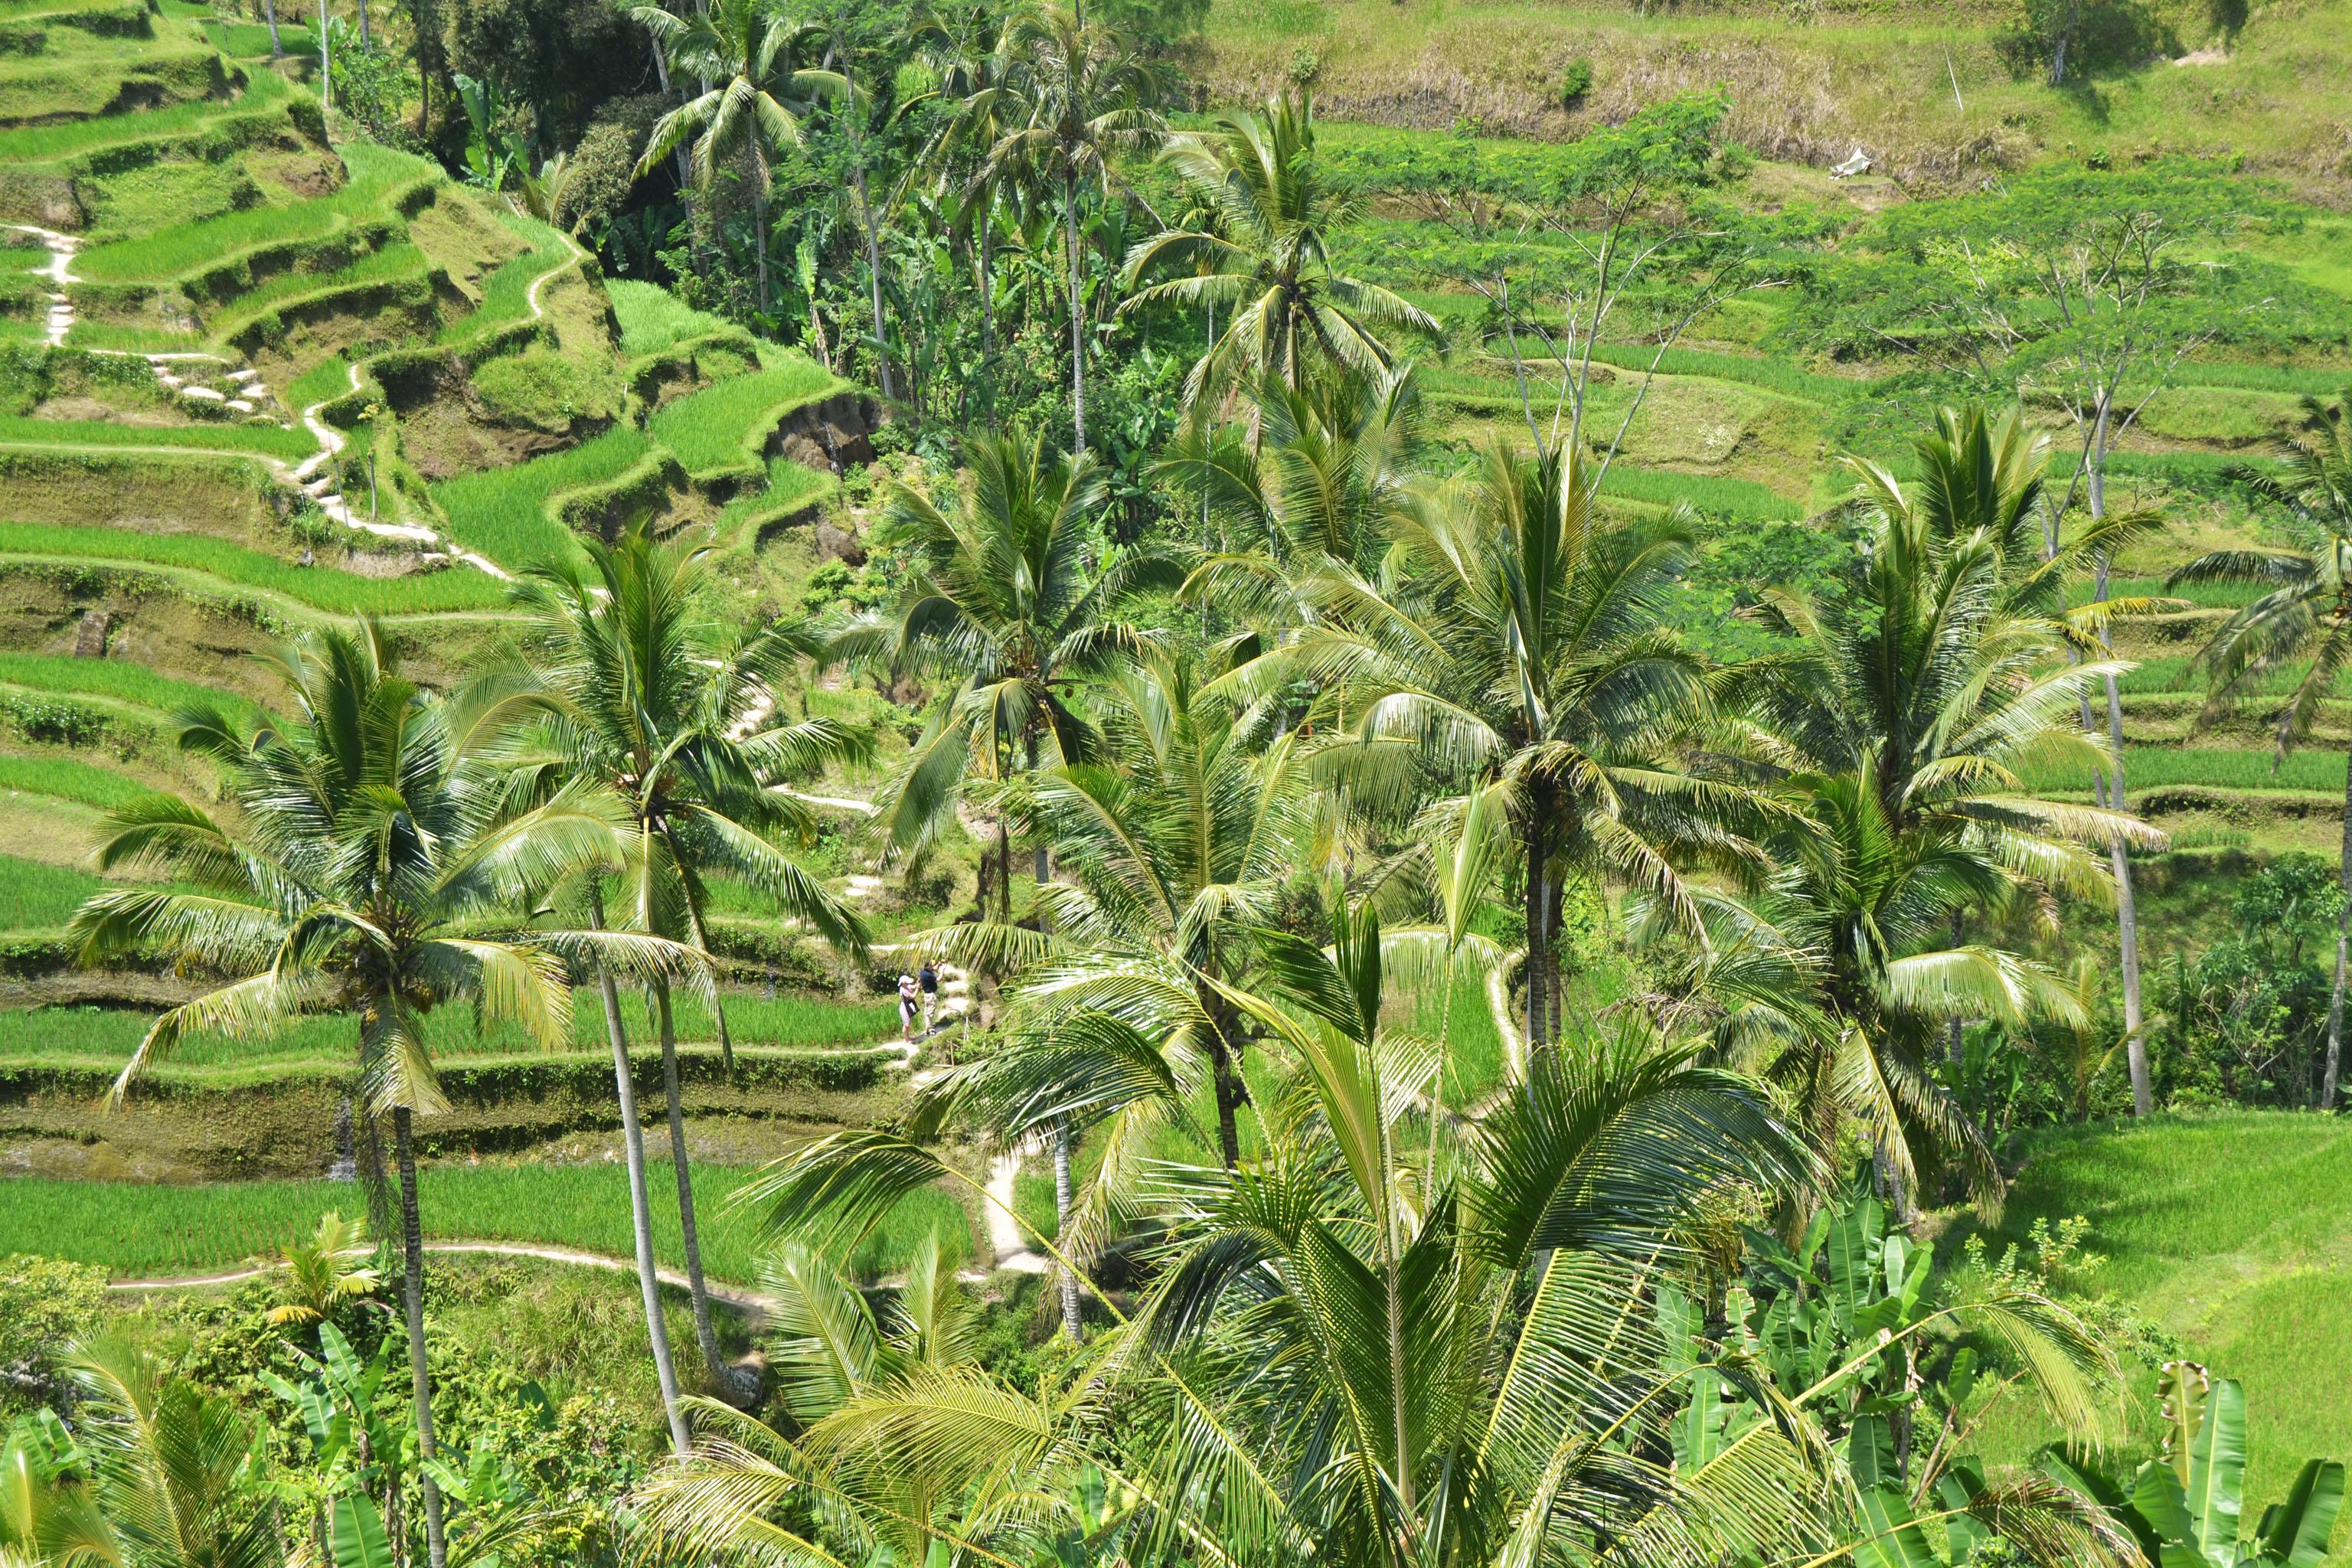 See the splendid rice fields